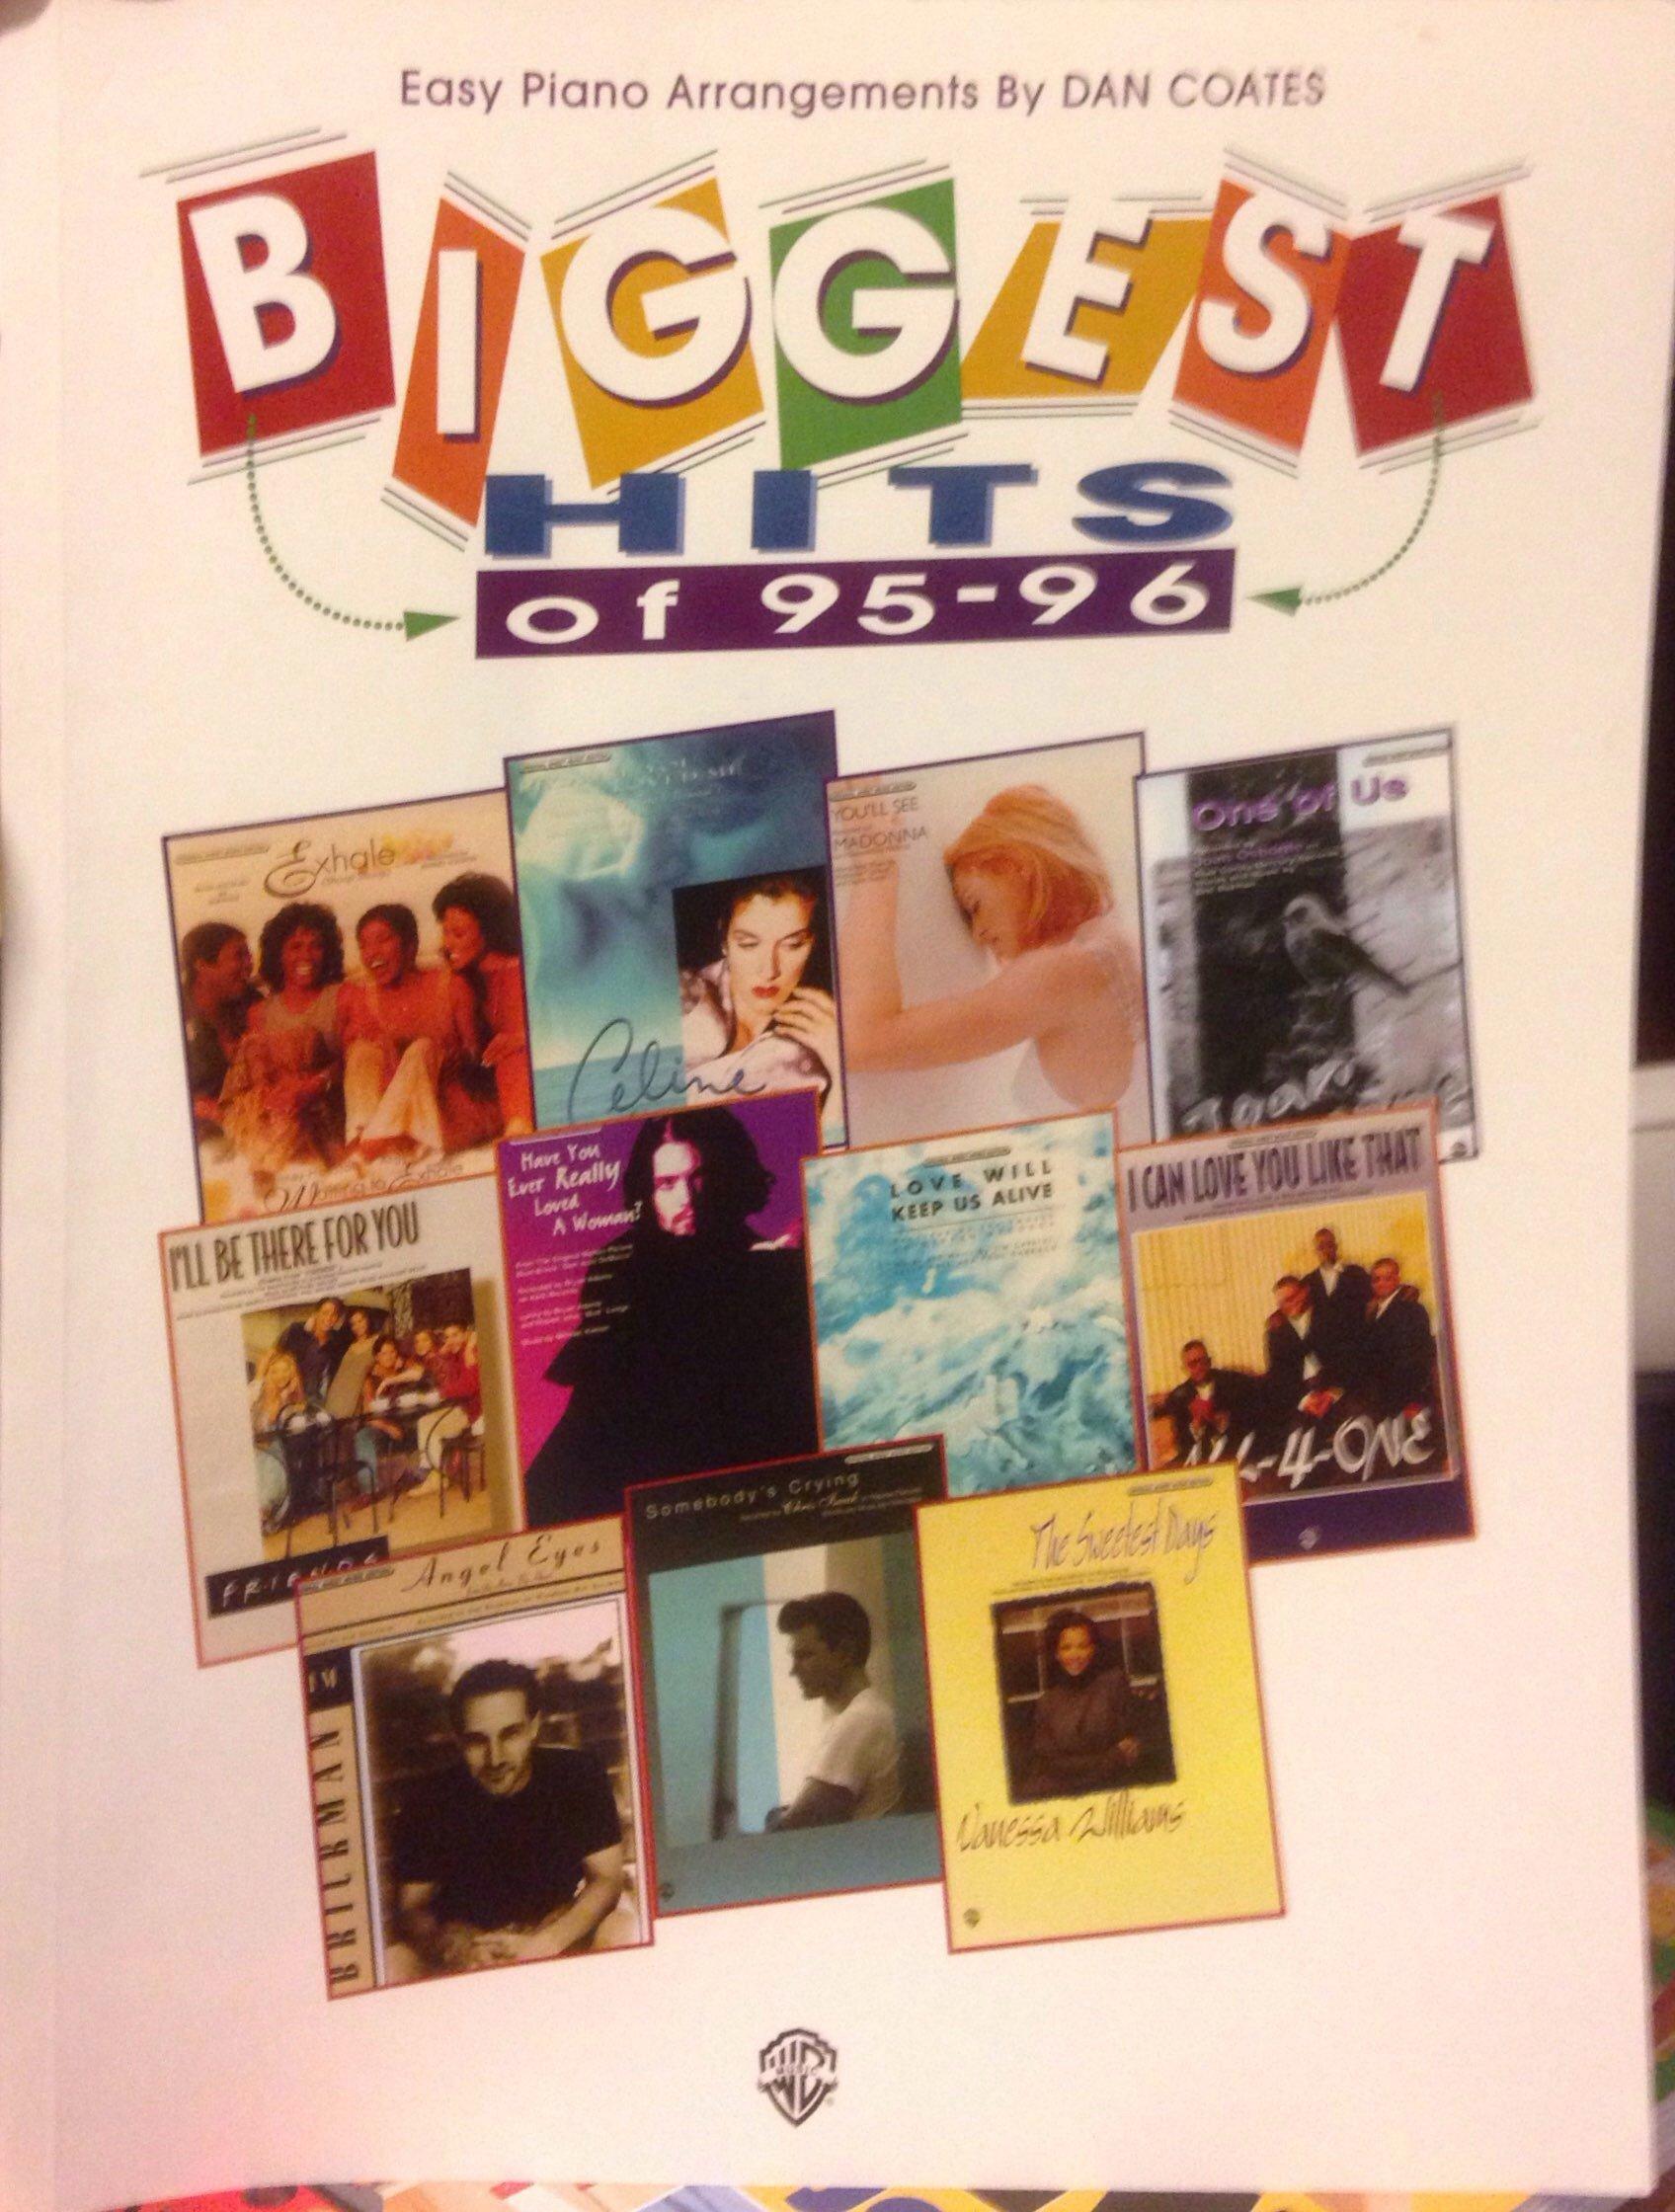 Biggest Hits of '95-'96